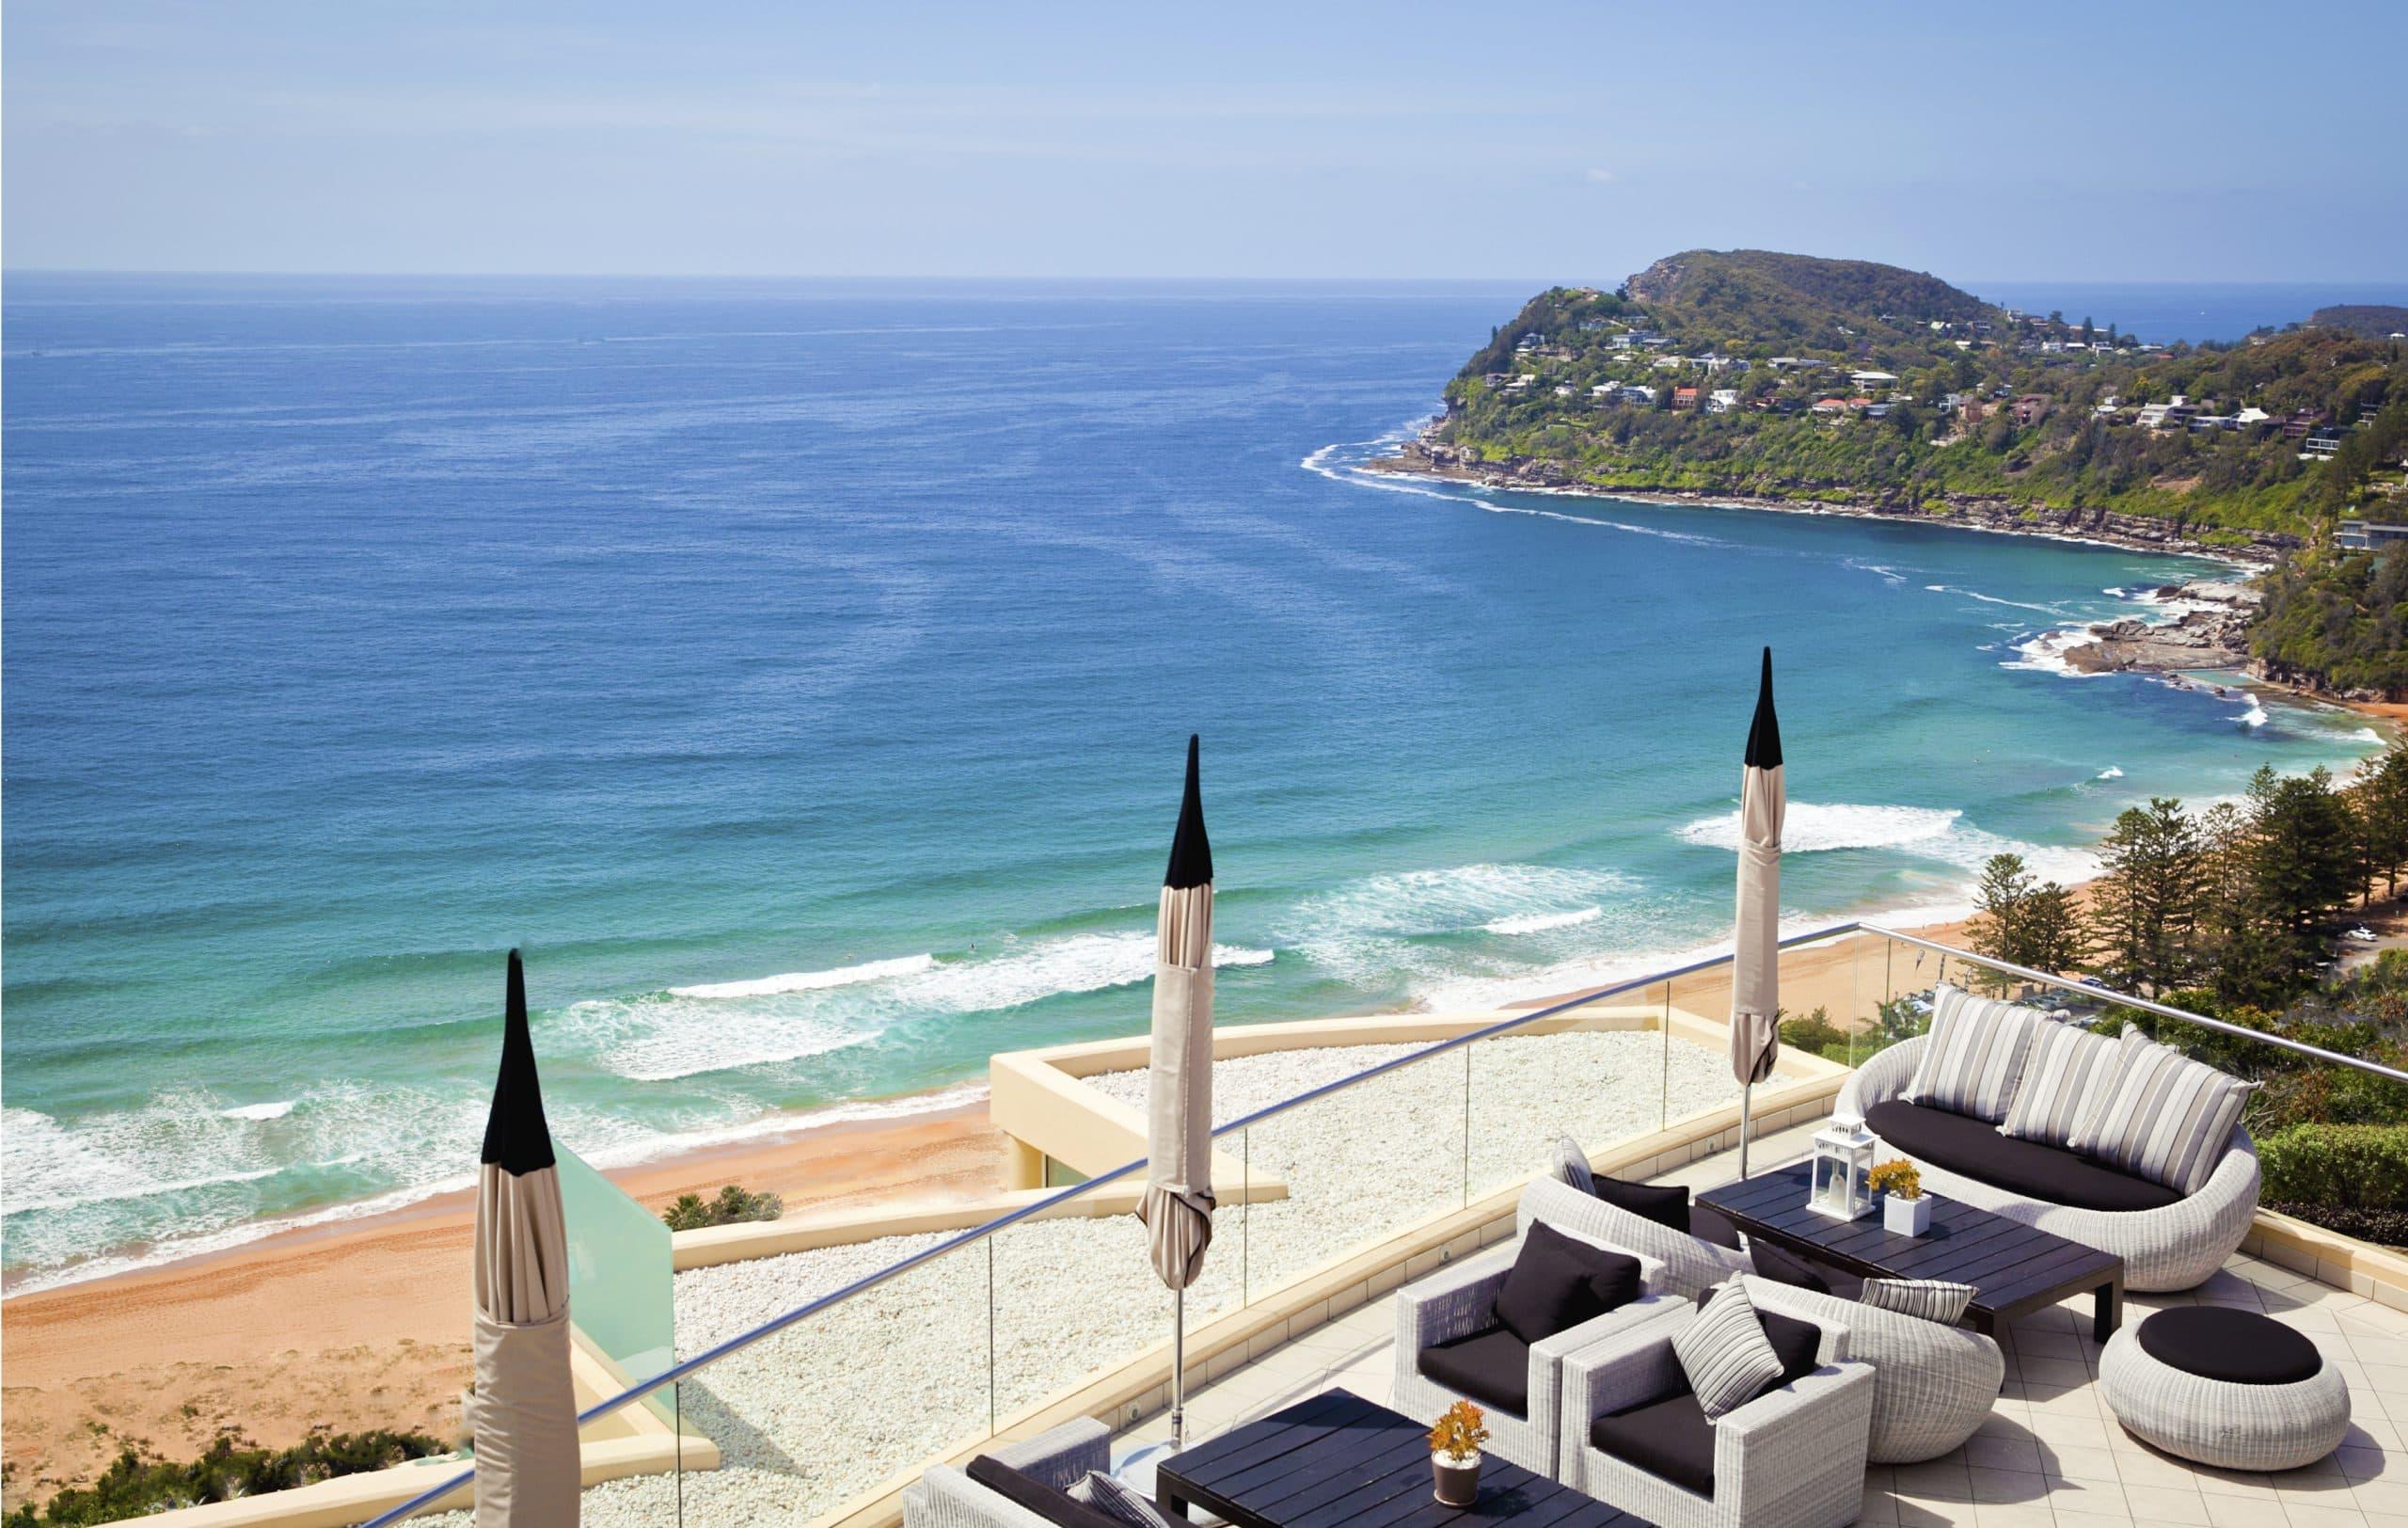 Northern Beaches, Sydney, Palm Beach, Avalon Beach, Pittwater, Whale Beach, Best Beaches, Best Surf Beaches, Sailing in Sydney, Luxury Accommodation Sydney, Best restaurants Northern Beaches, Best Accommodation Northern Beaches